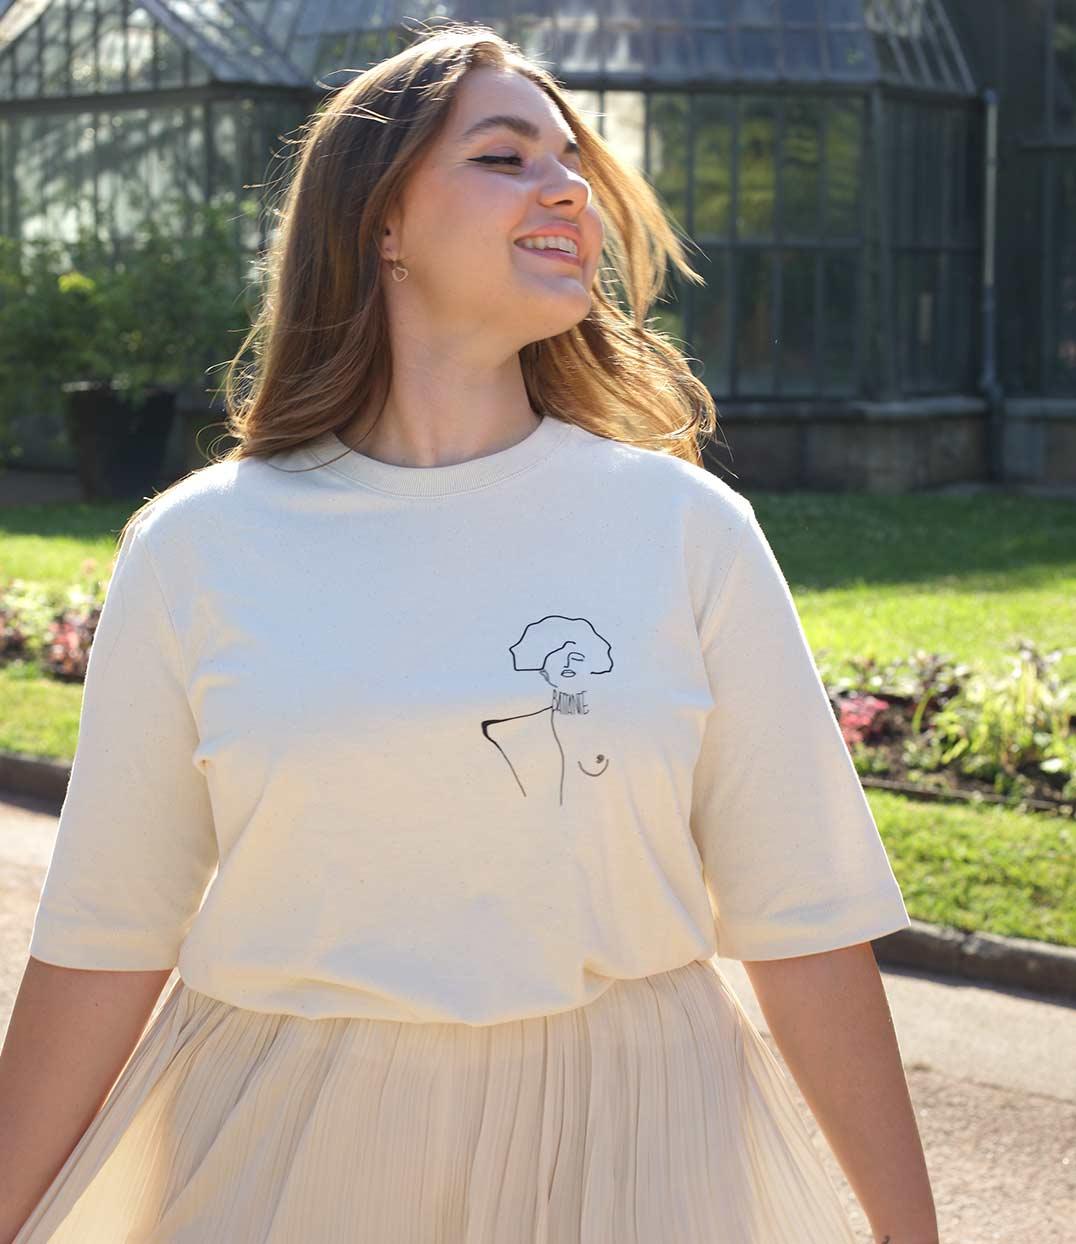 femme souriante qui porte un t-shirt crème KLIMT en coton bio de la marque leonor roversi